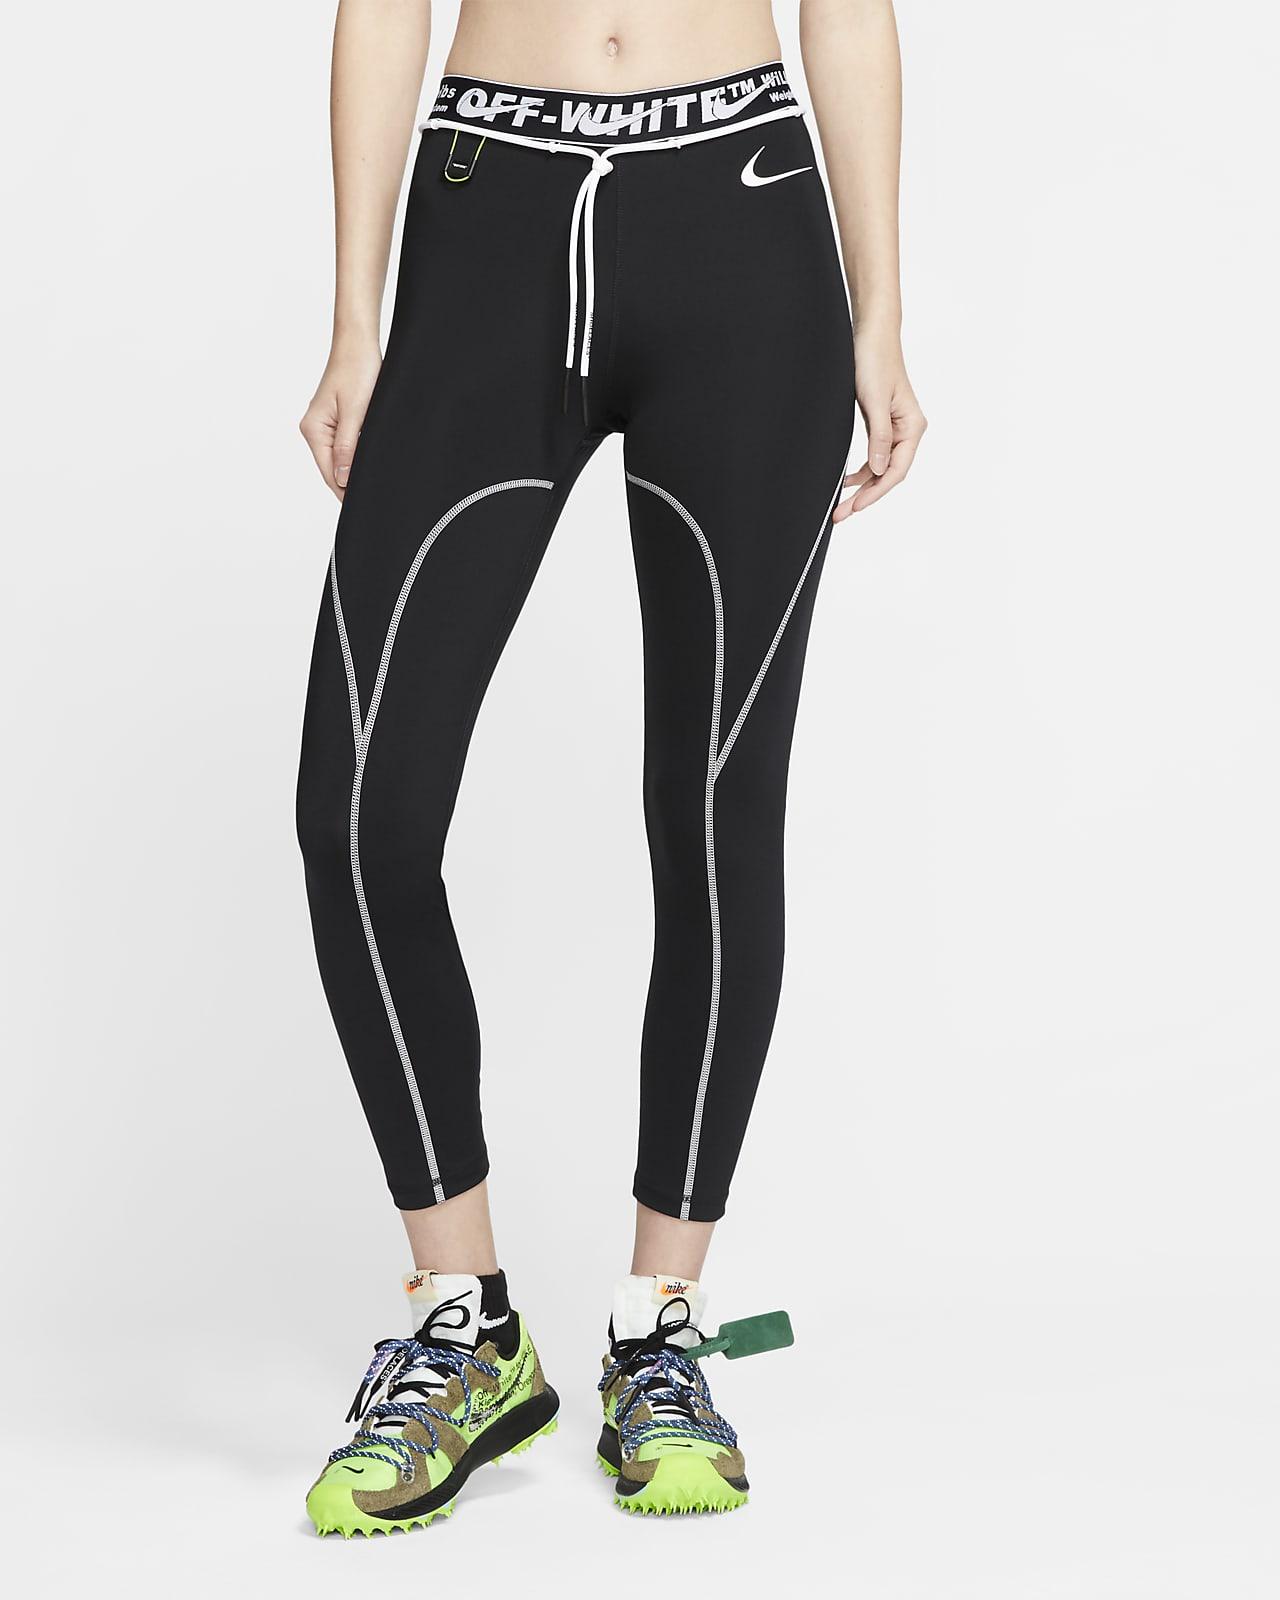 Nike x Off-White™ Pro Women's Tights